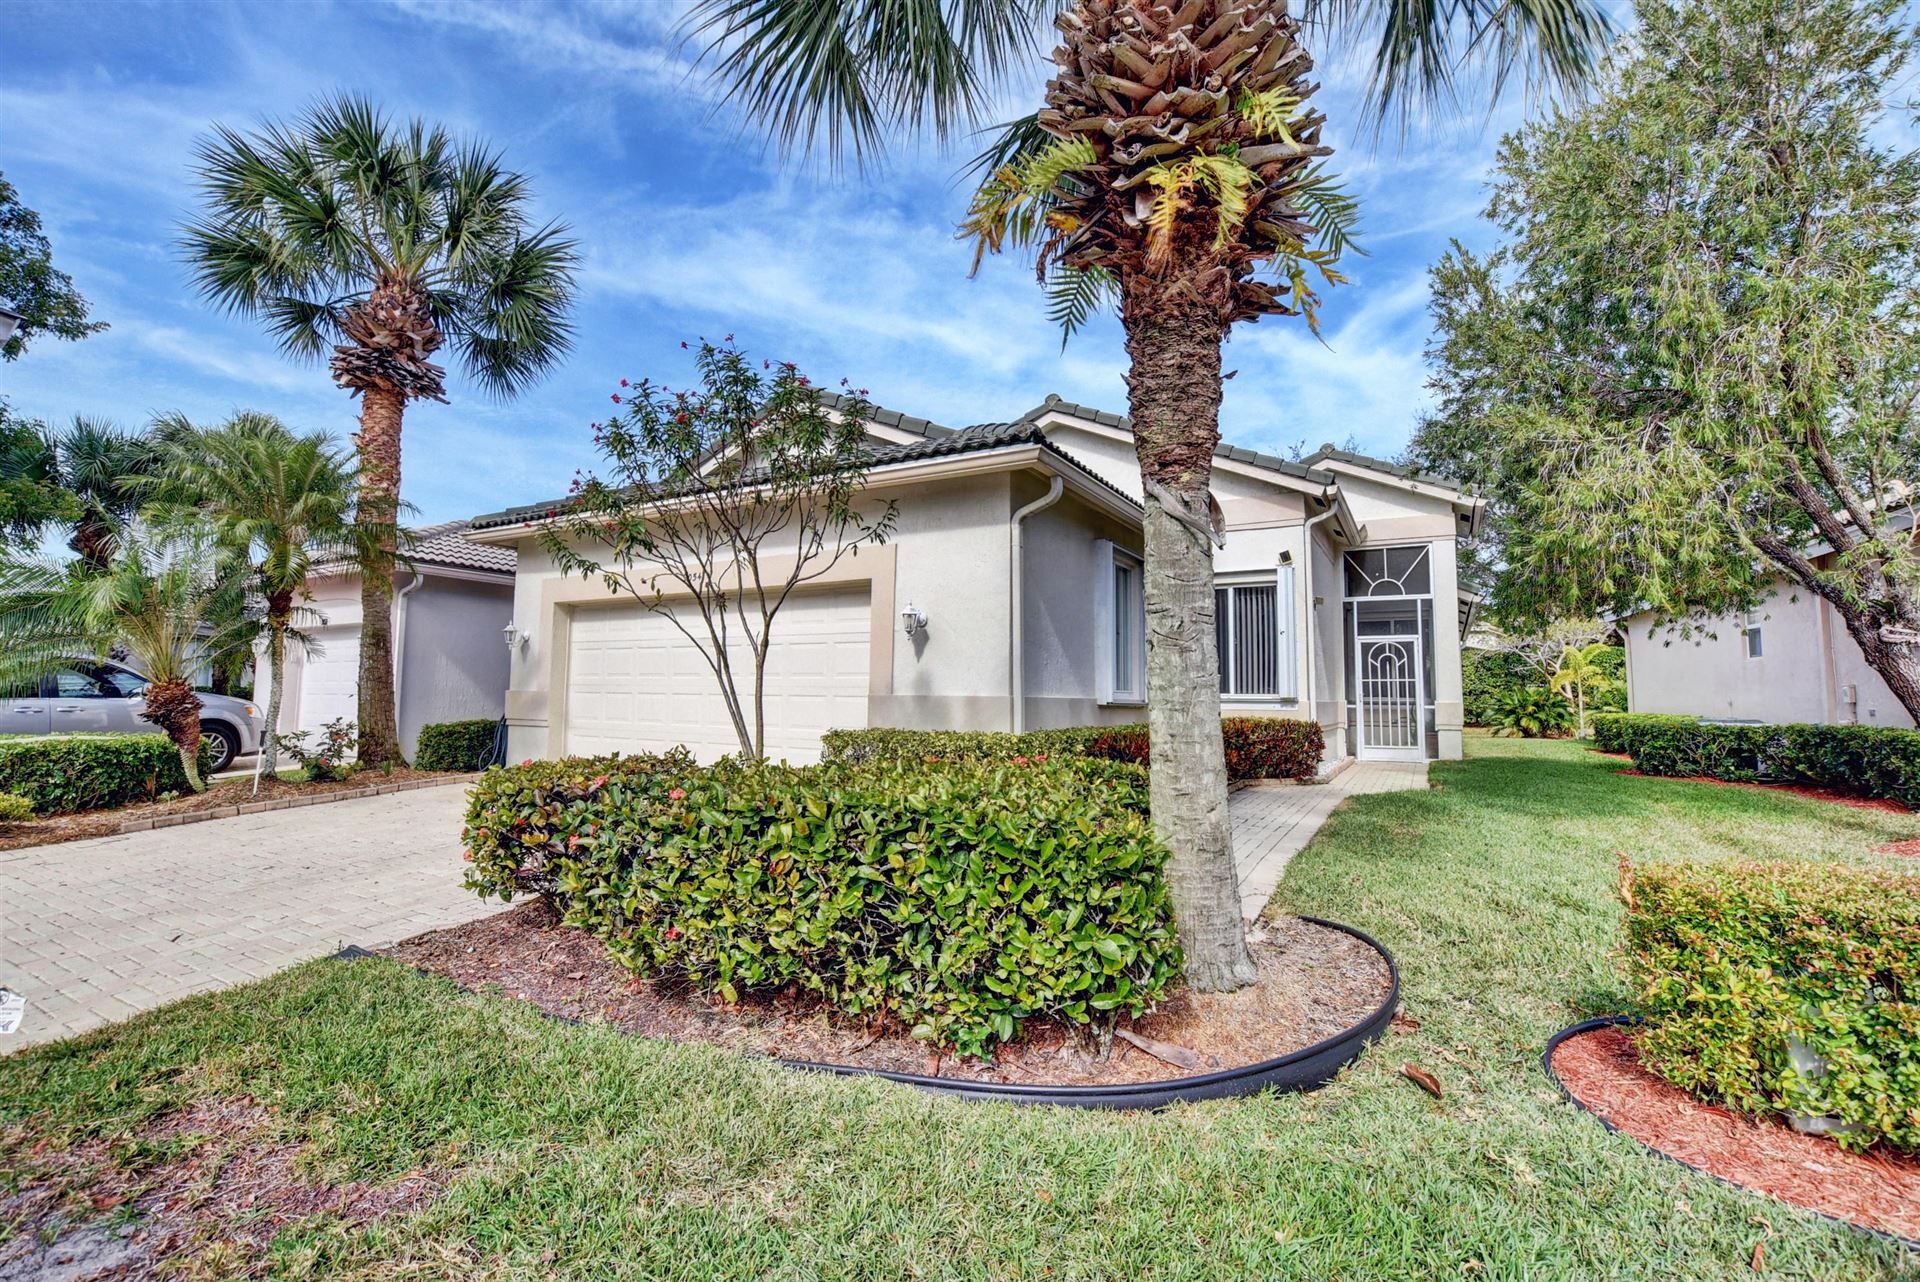 9054 Bay Point Circle, West Palm Beach, FL 33411 - #: RX-10684543